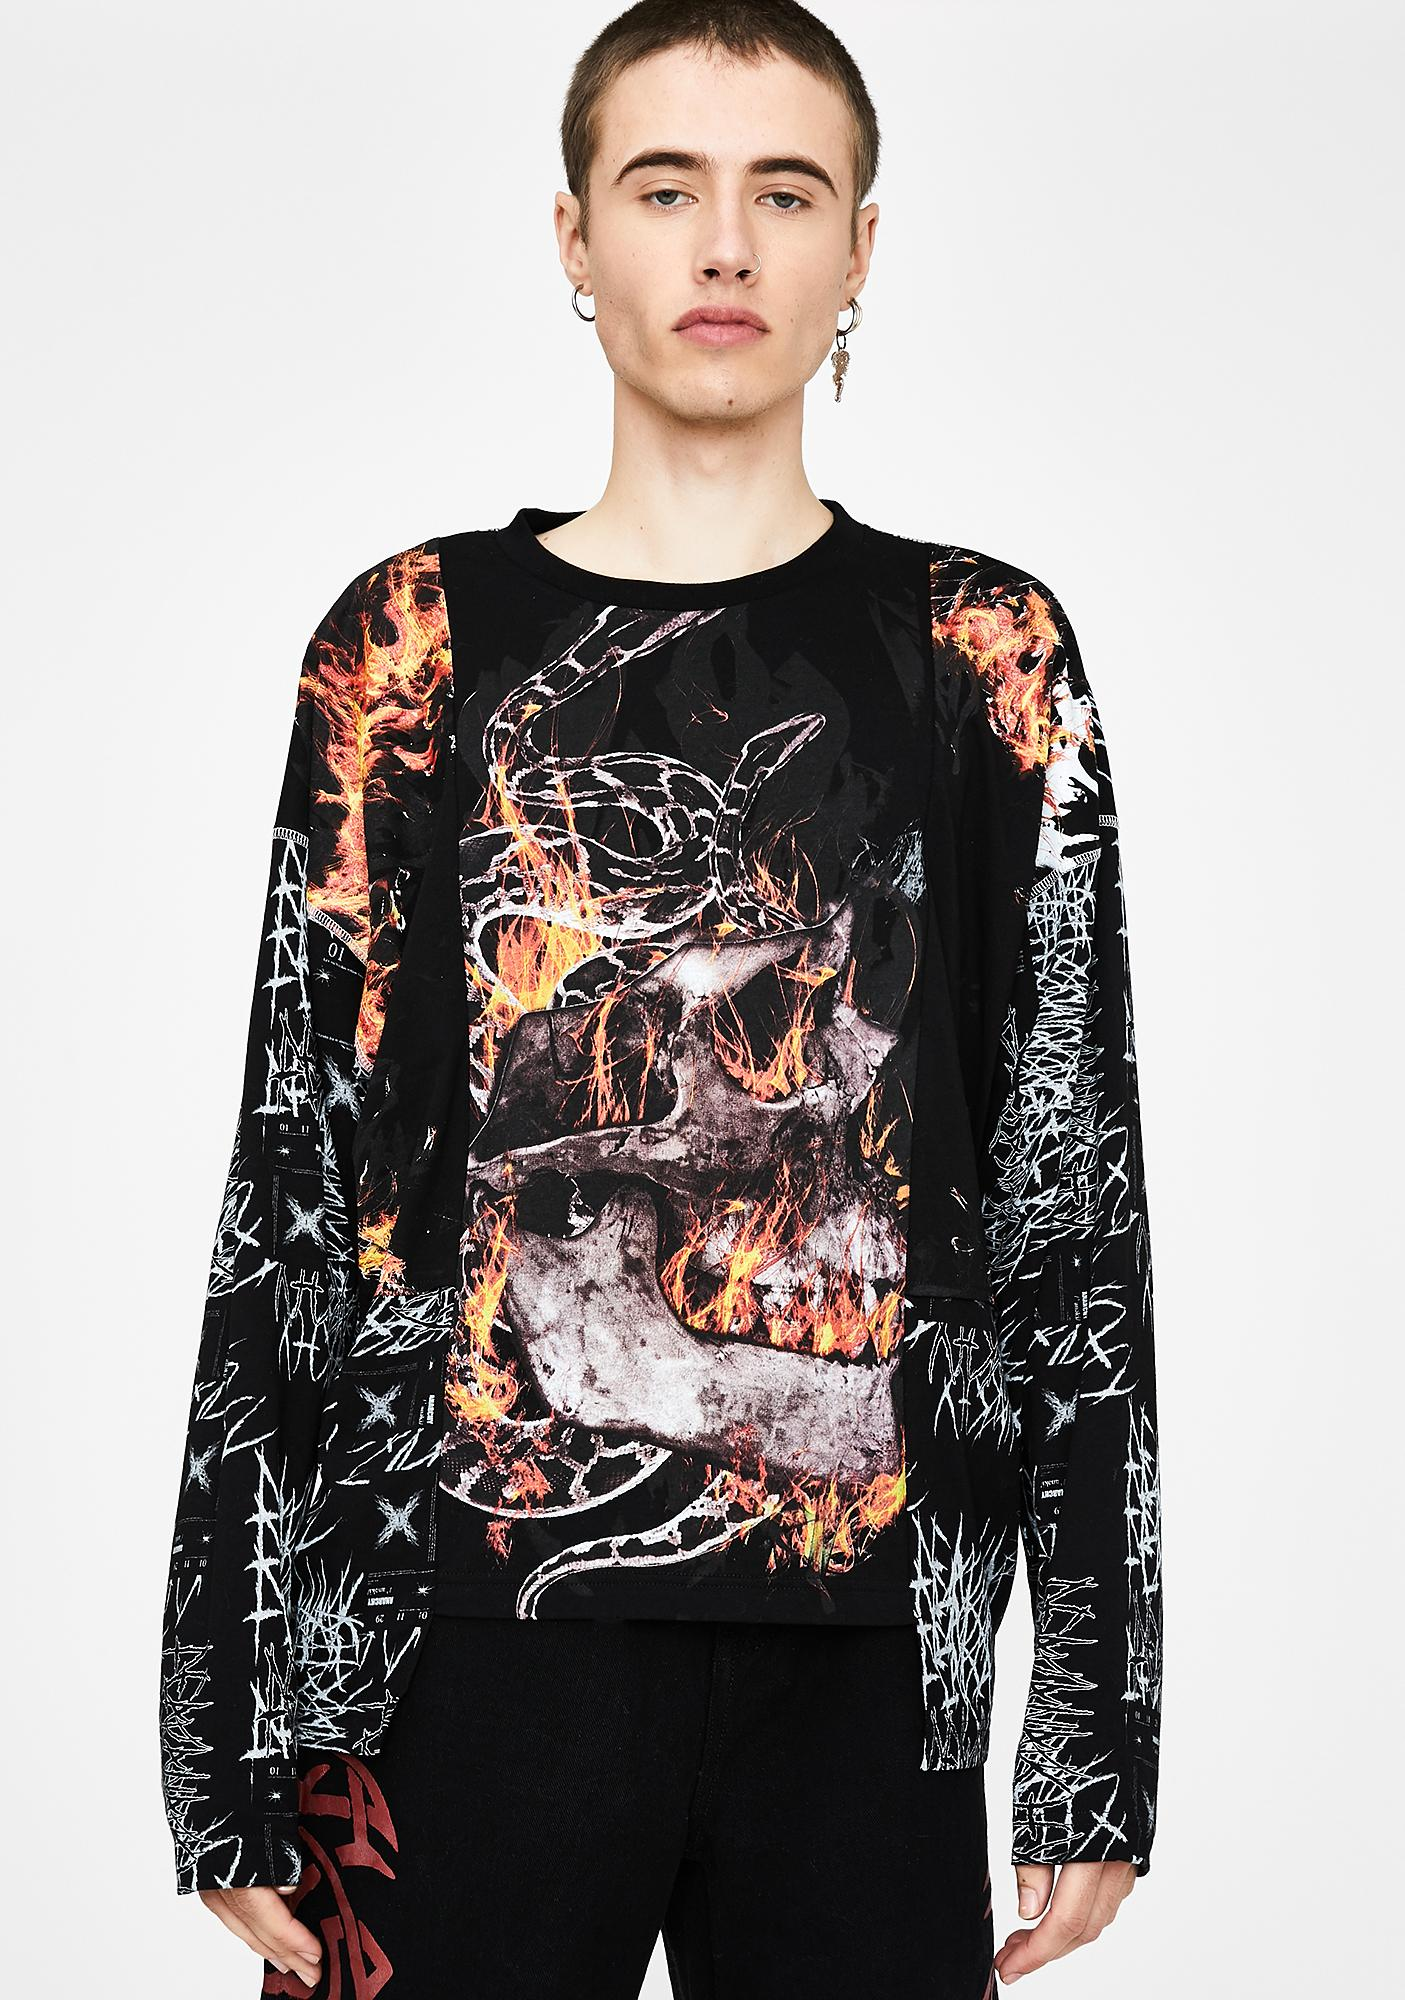 Jaded London Anarchy Skull & Flame Long Sleeve Tee